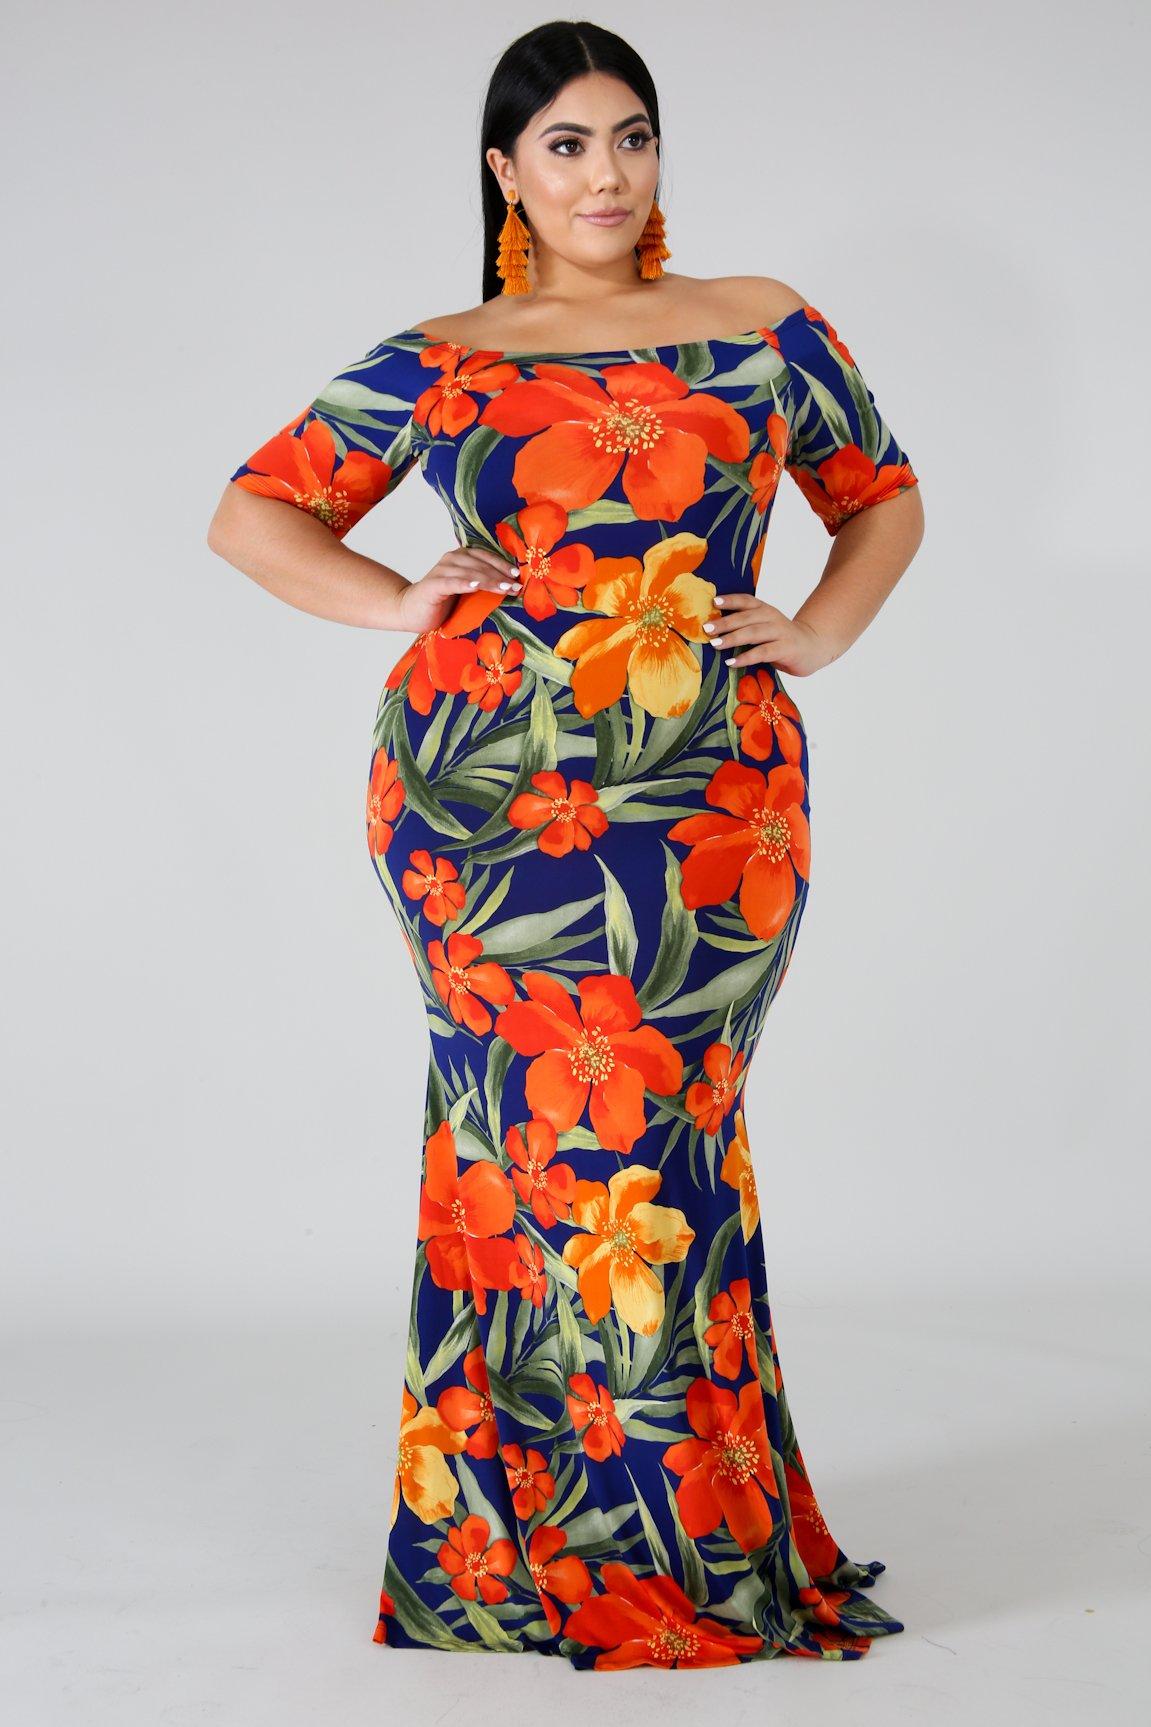 California Poppy Mermaid Dress